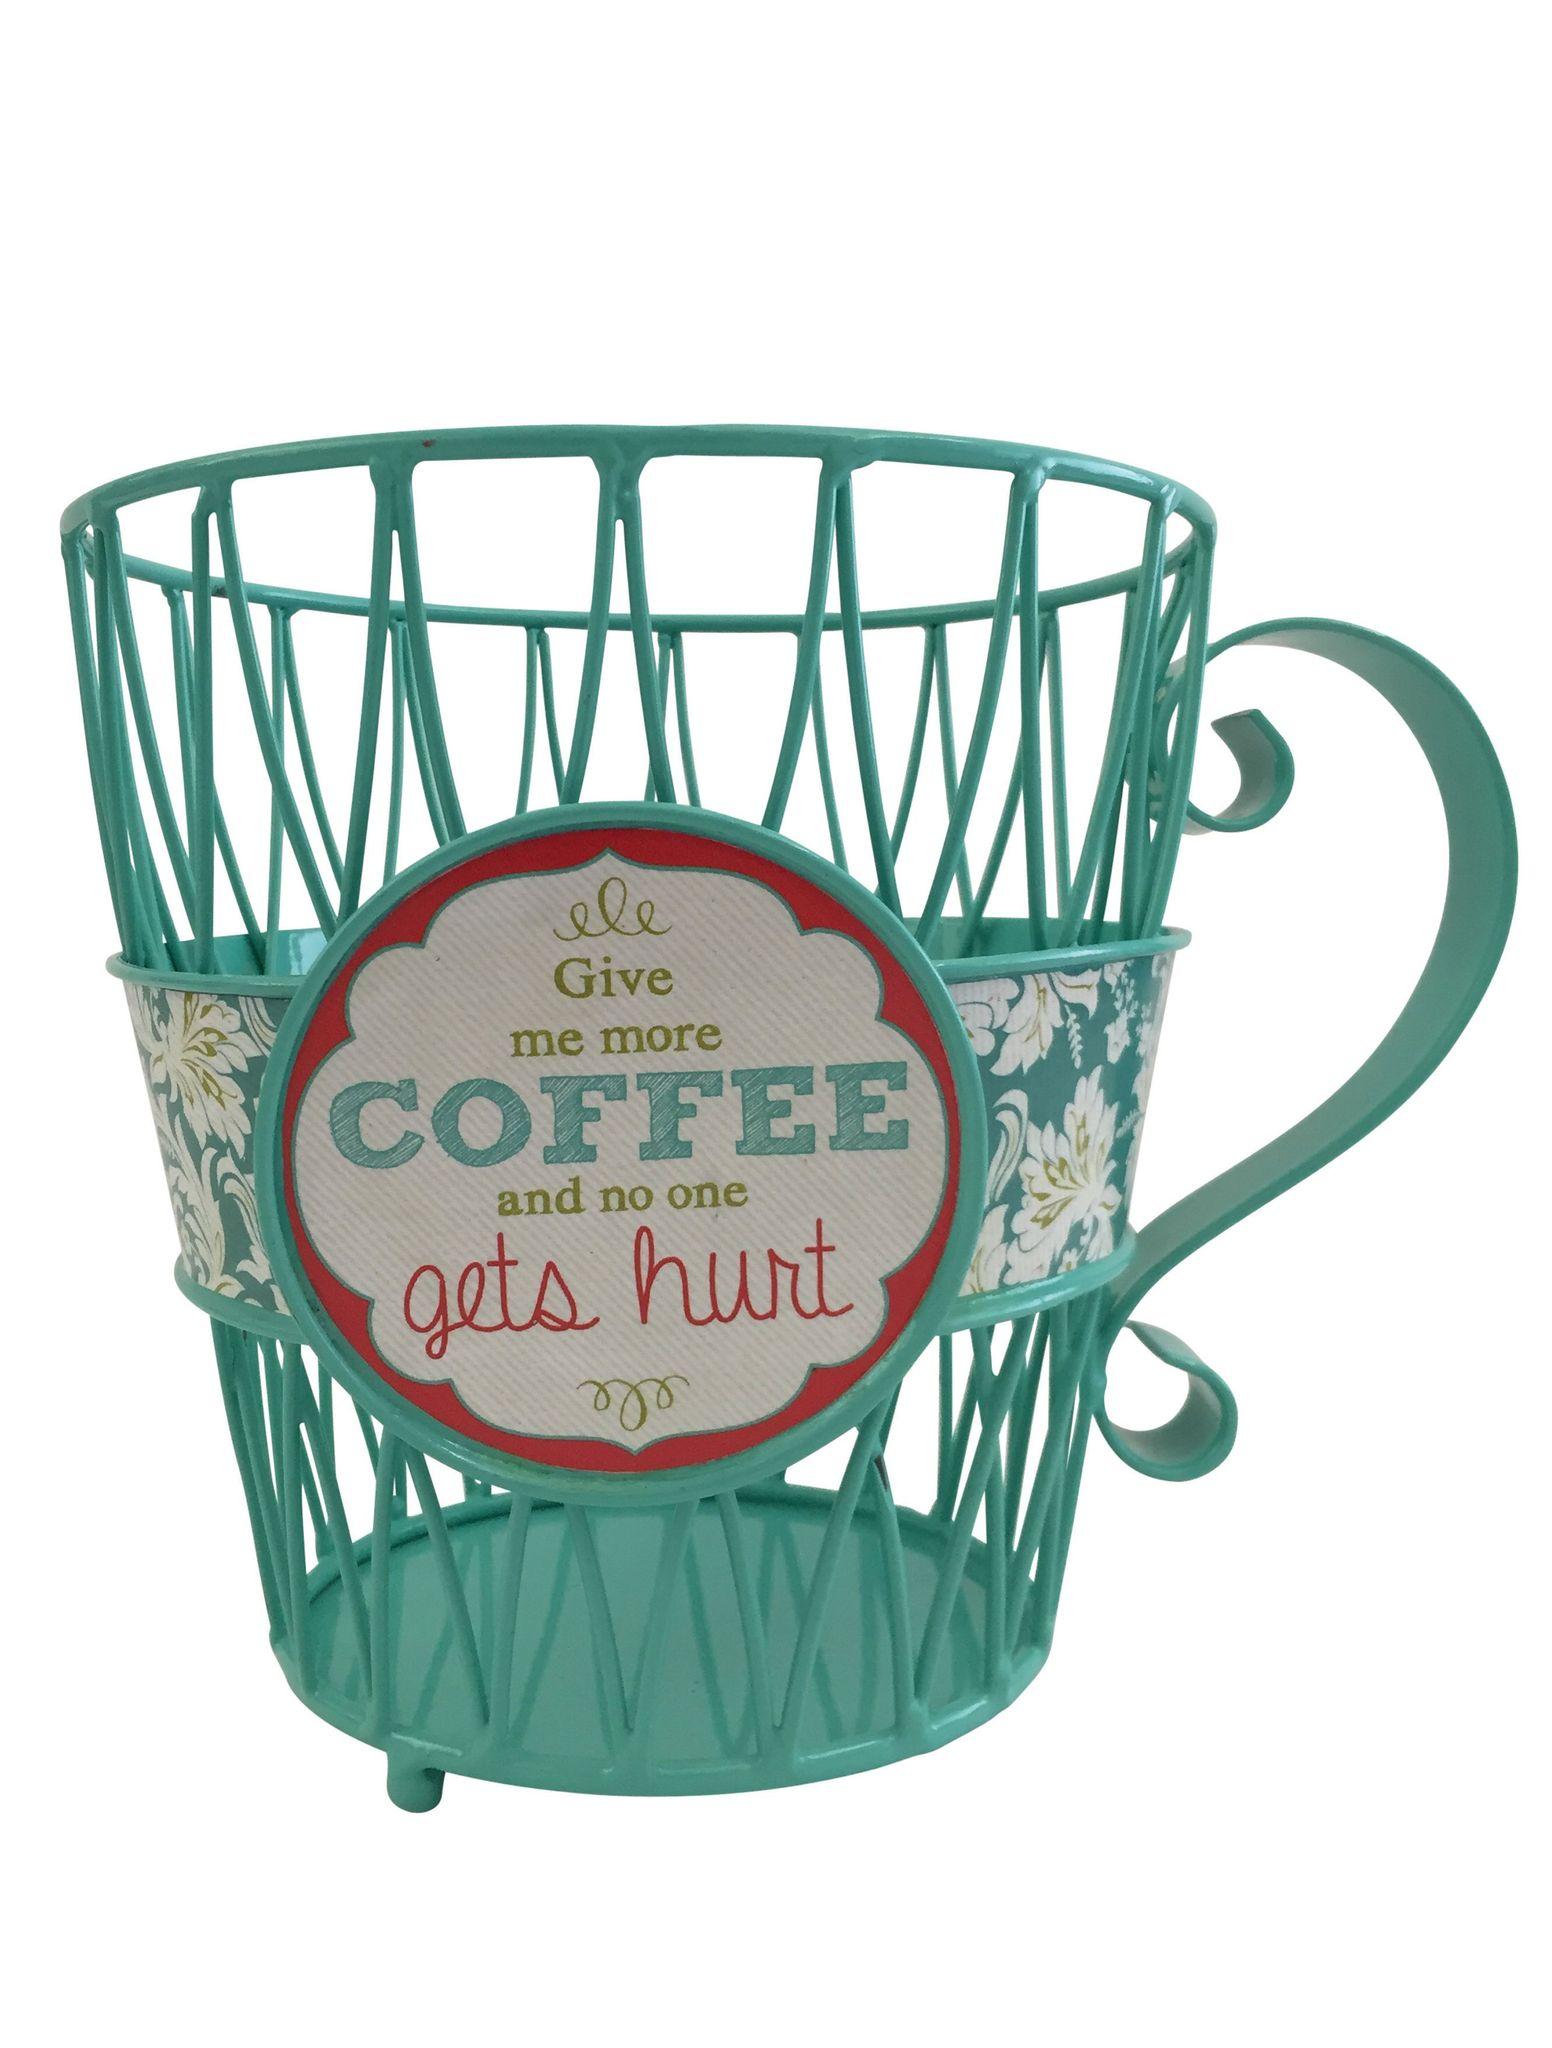 Кухня Корзина для кофейных капсул Boston Warehouse Give Me Coffee korzina-dlya-kofeynyh-kapsul-boston-warehouse-give-me-coffee-ssha-kitay.jpg